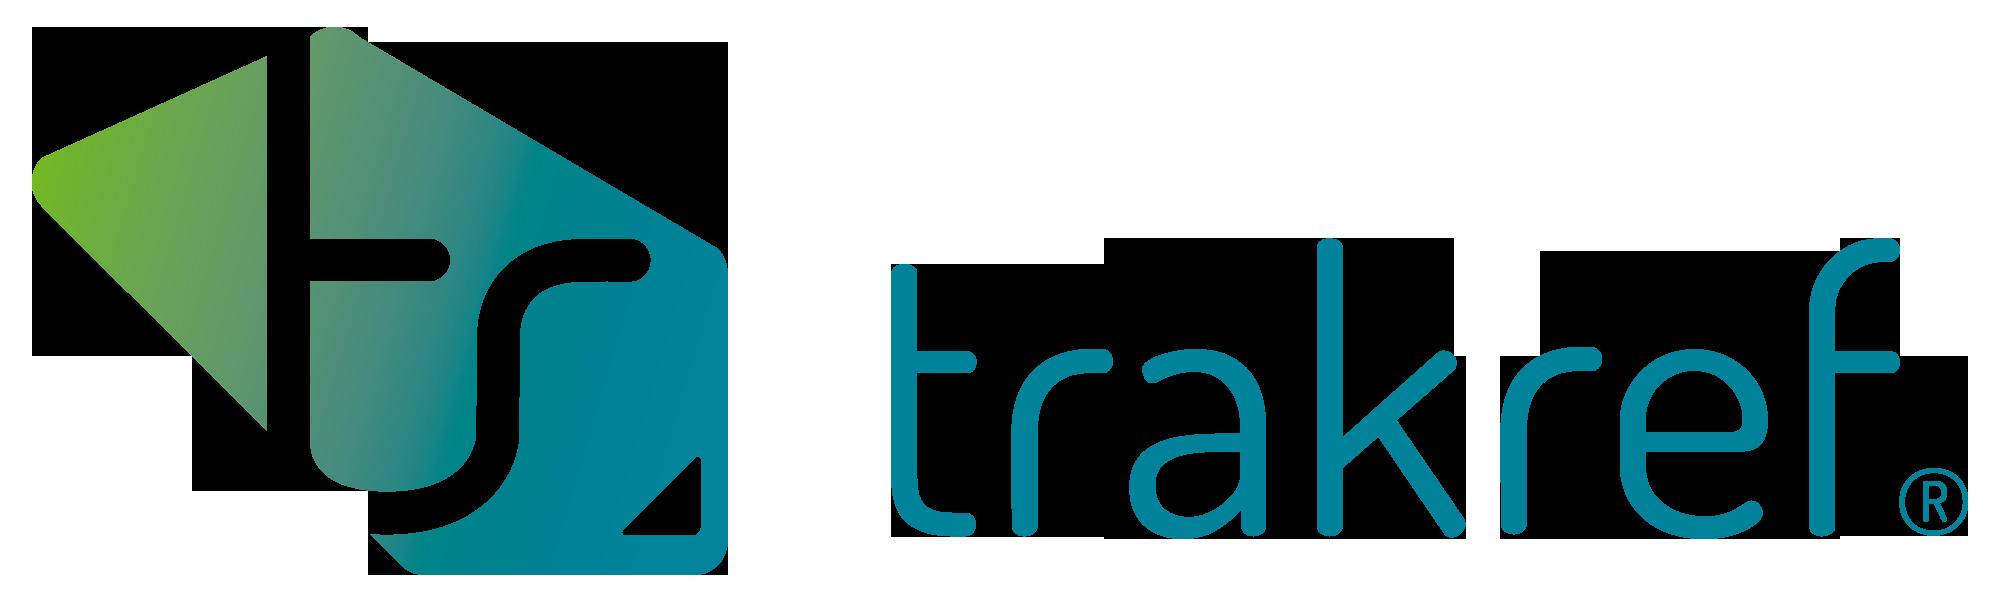 trakref-logo-lrg-rgb-1.png